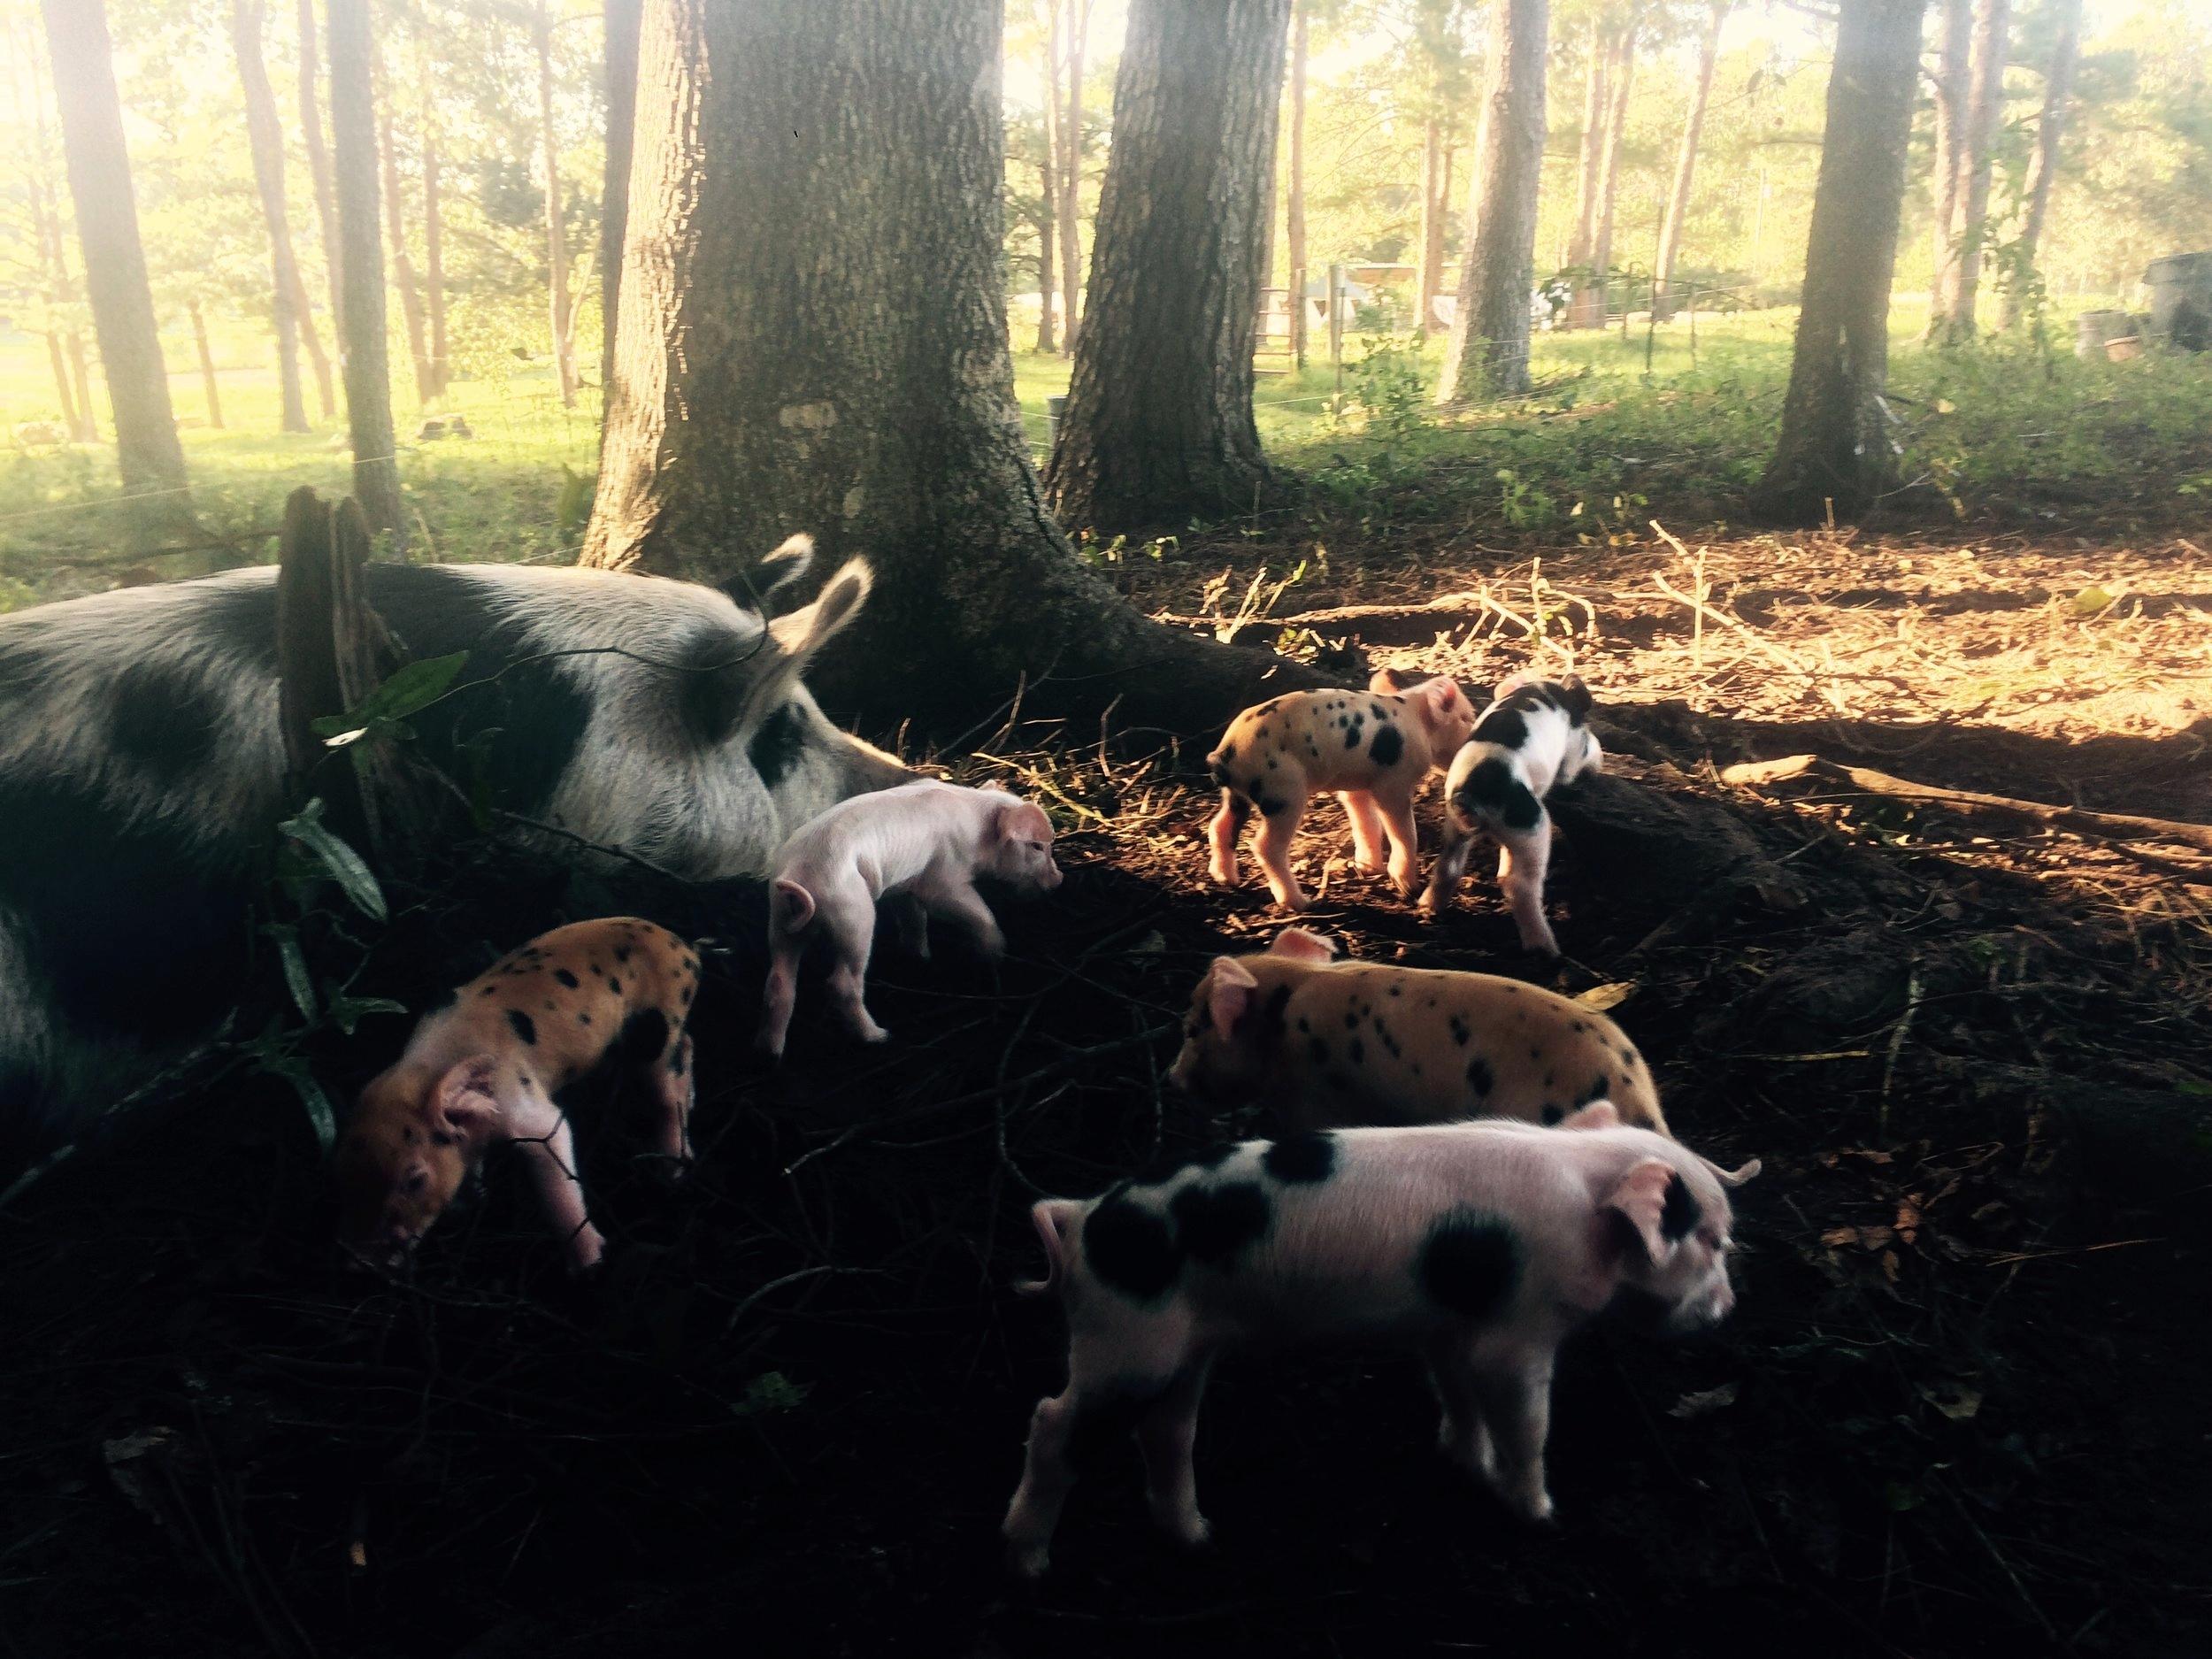 A newborn litter of piglets and their mother.